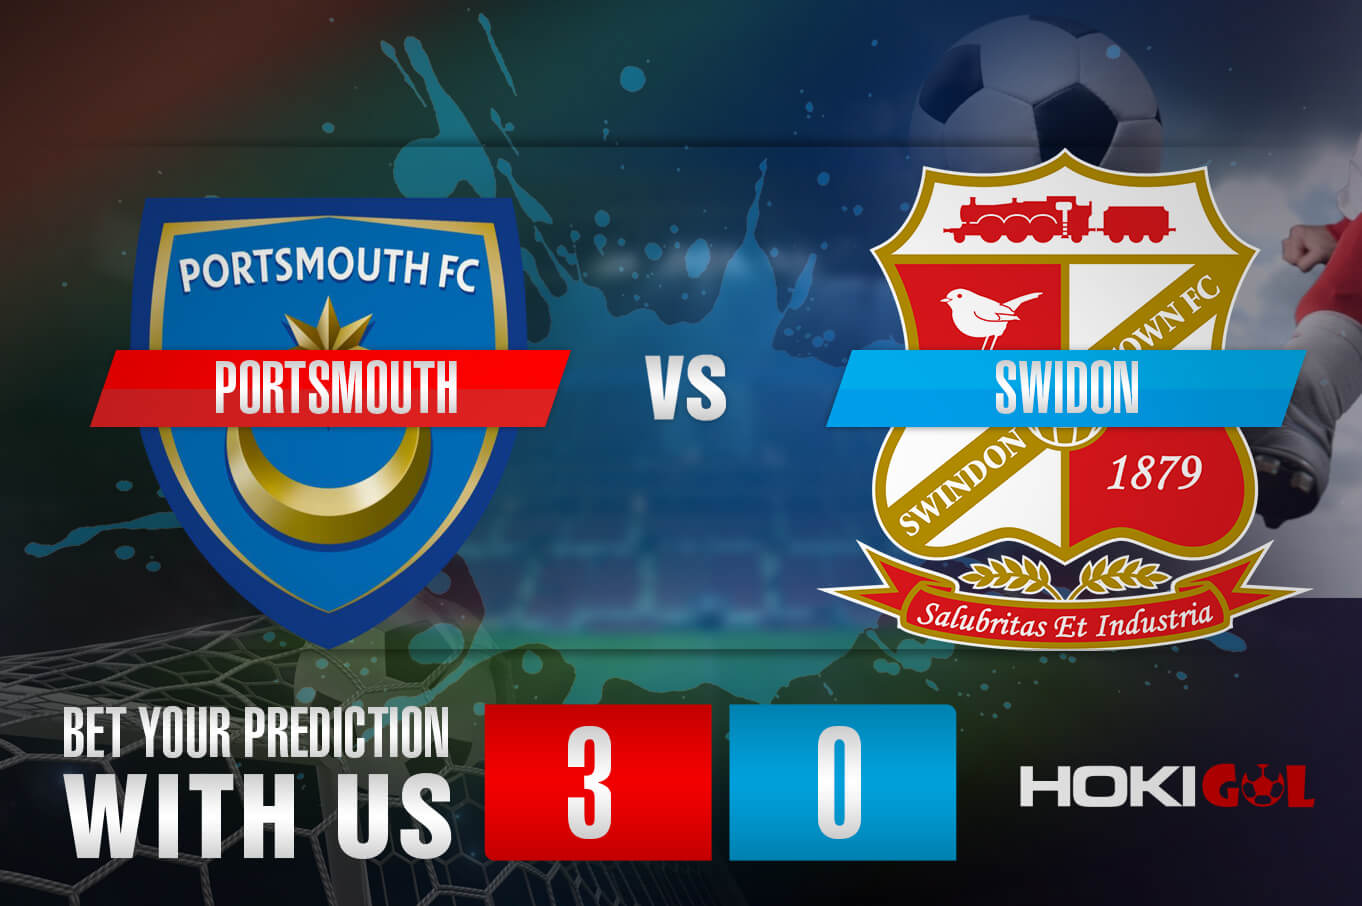 Prediksi Bola Portsmouth Vs Swindon 26 Desember 2020